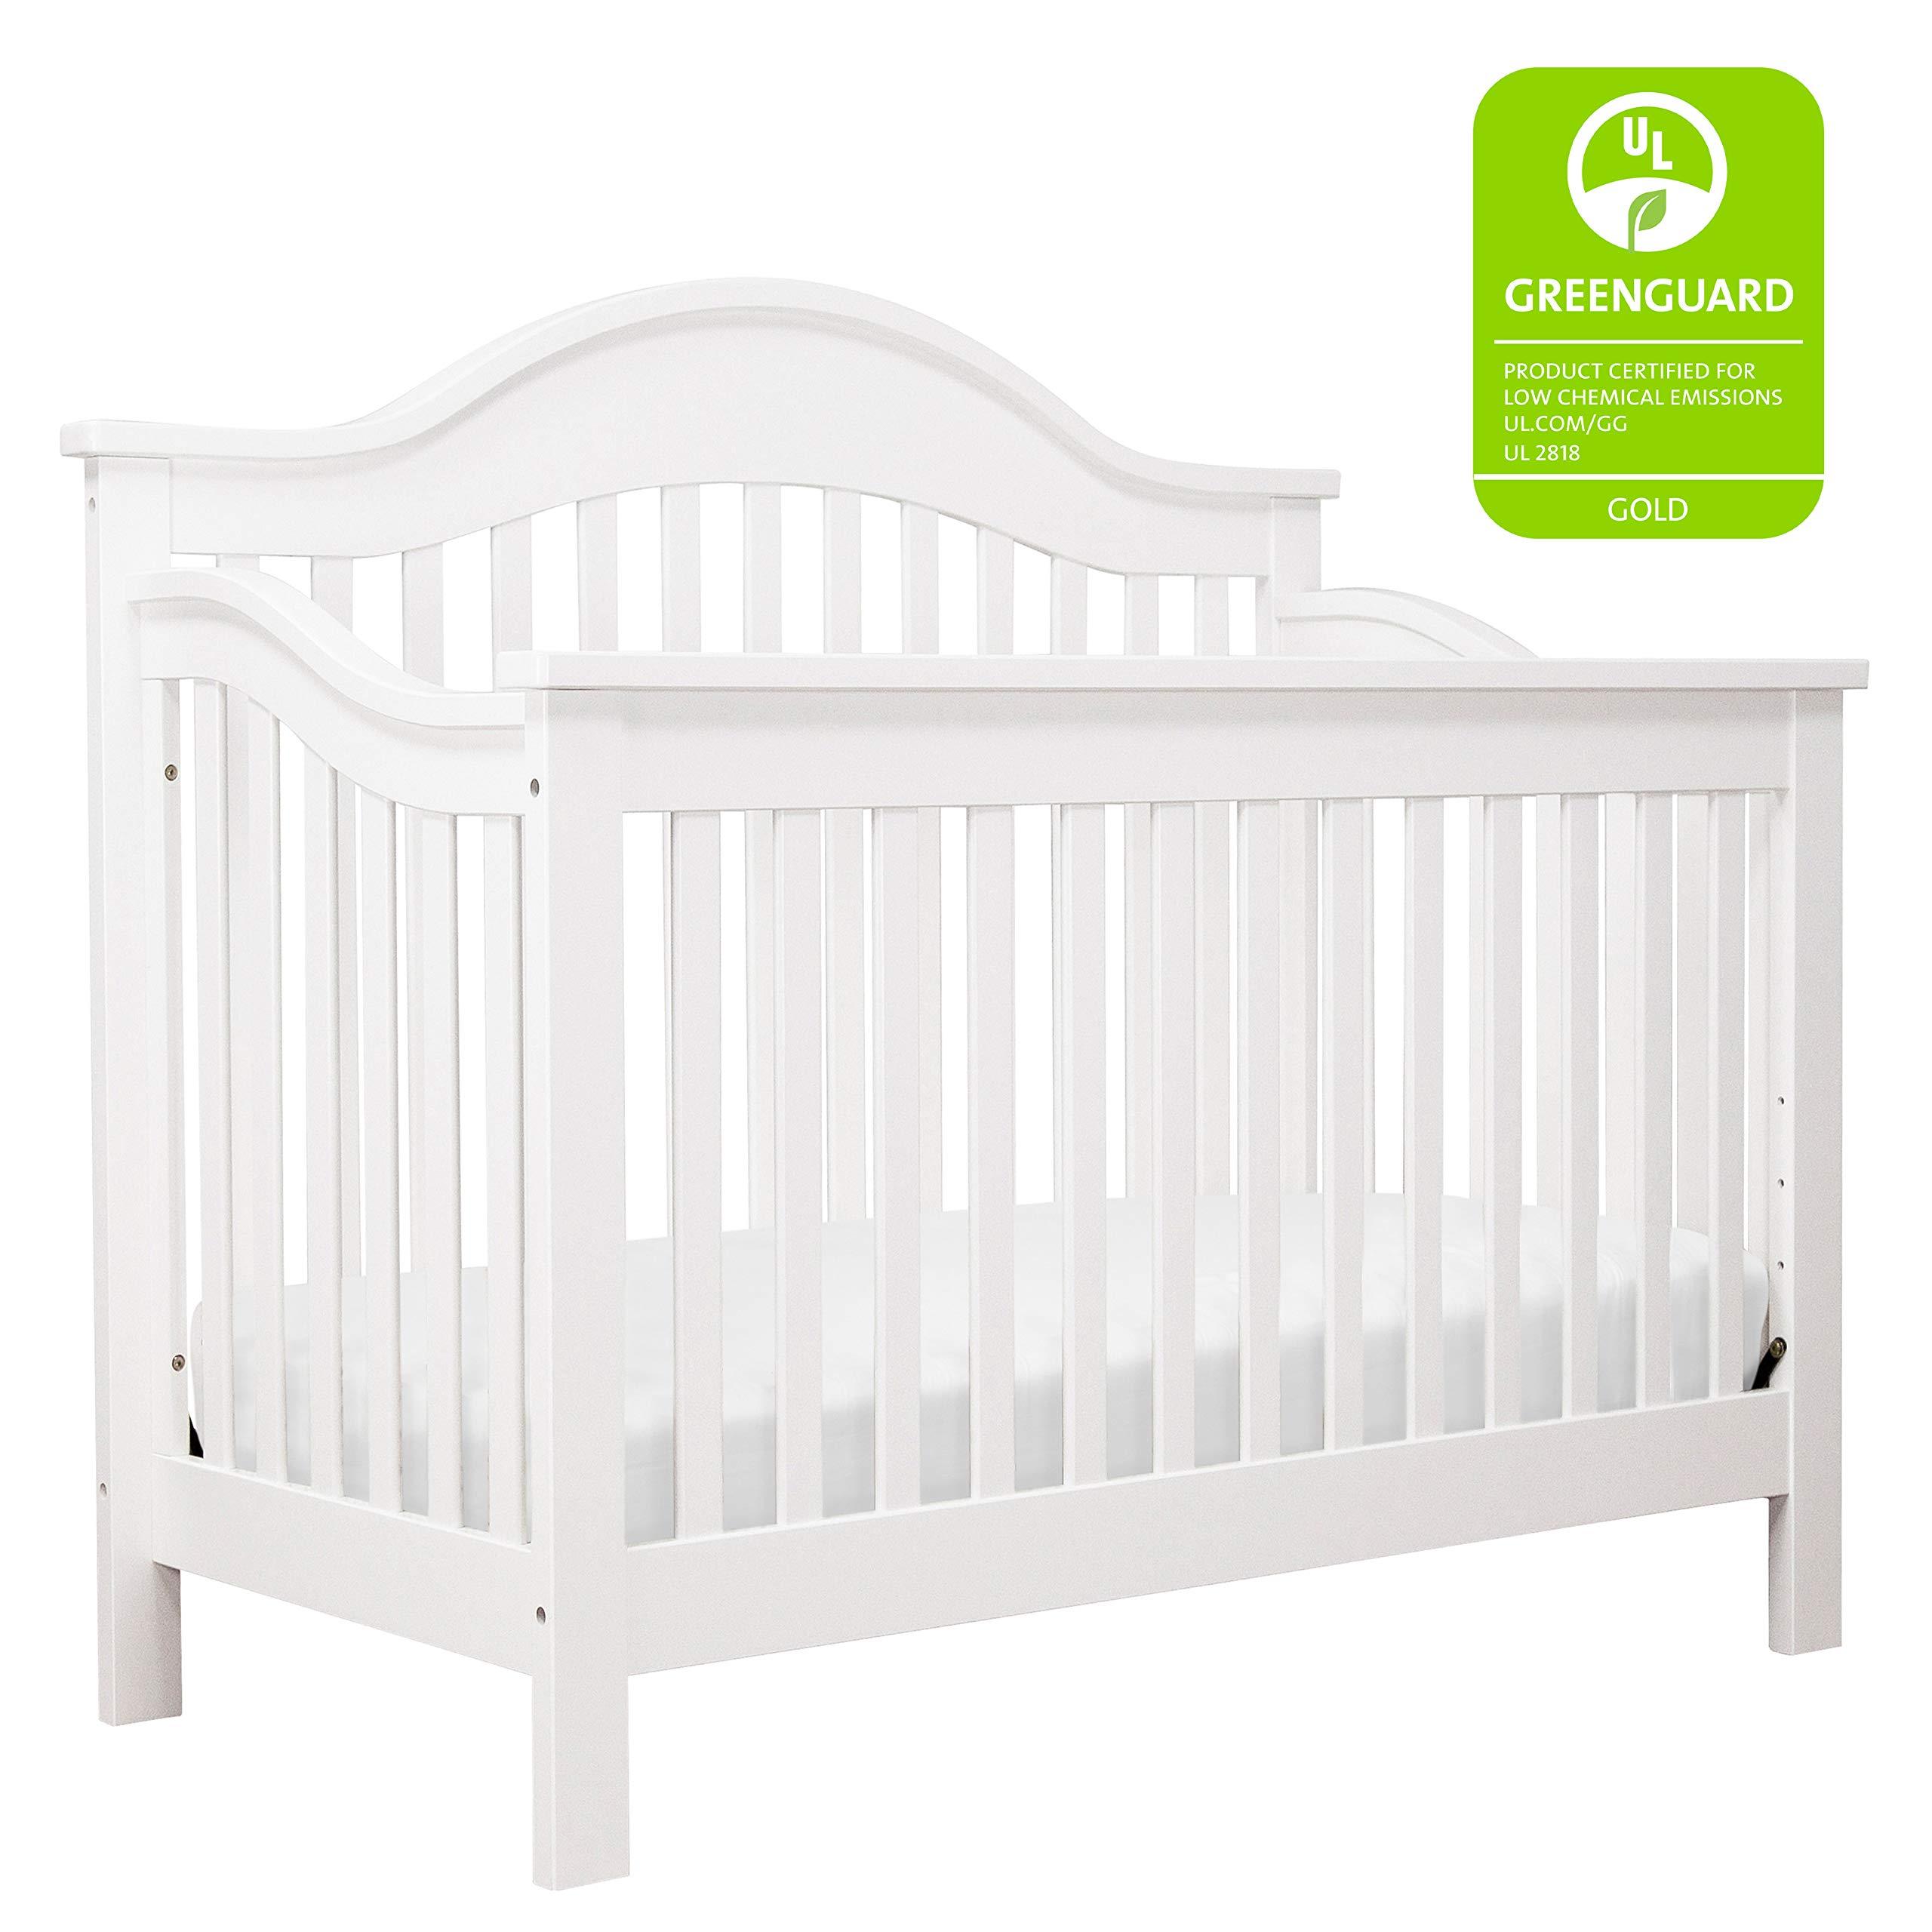 DaVinci Jayden 4-in-1 Convertible Crib in White   Greenguard Gold Certified by DaVinci